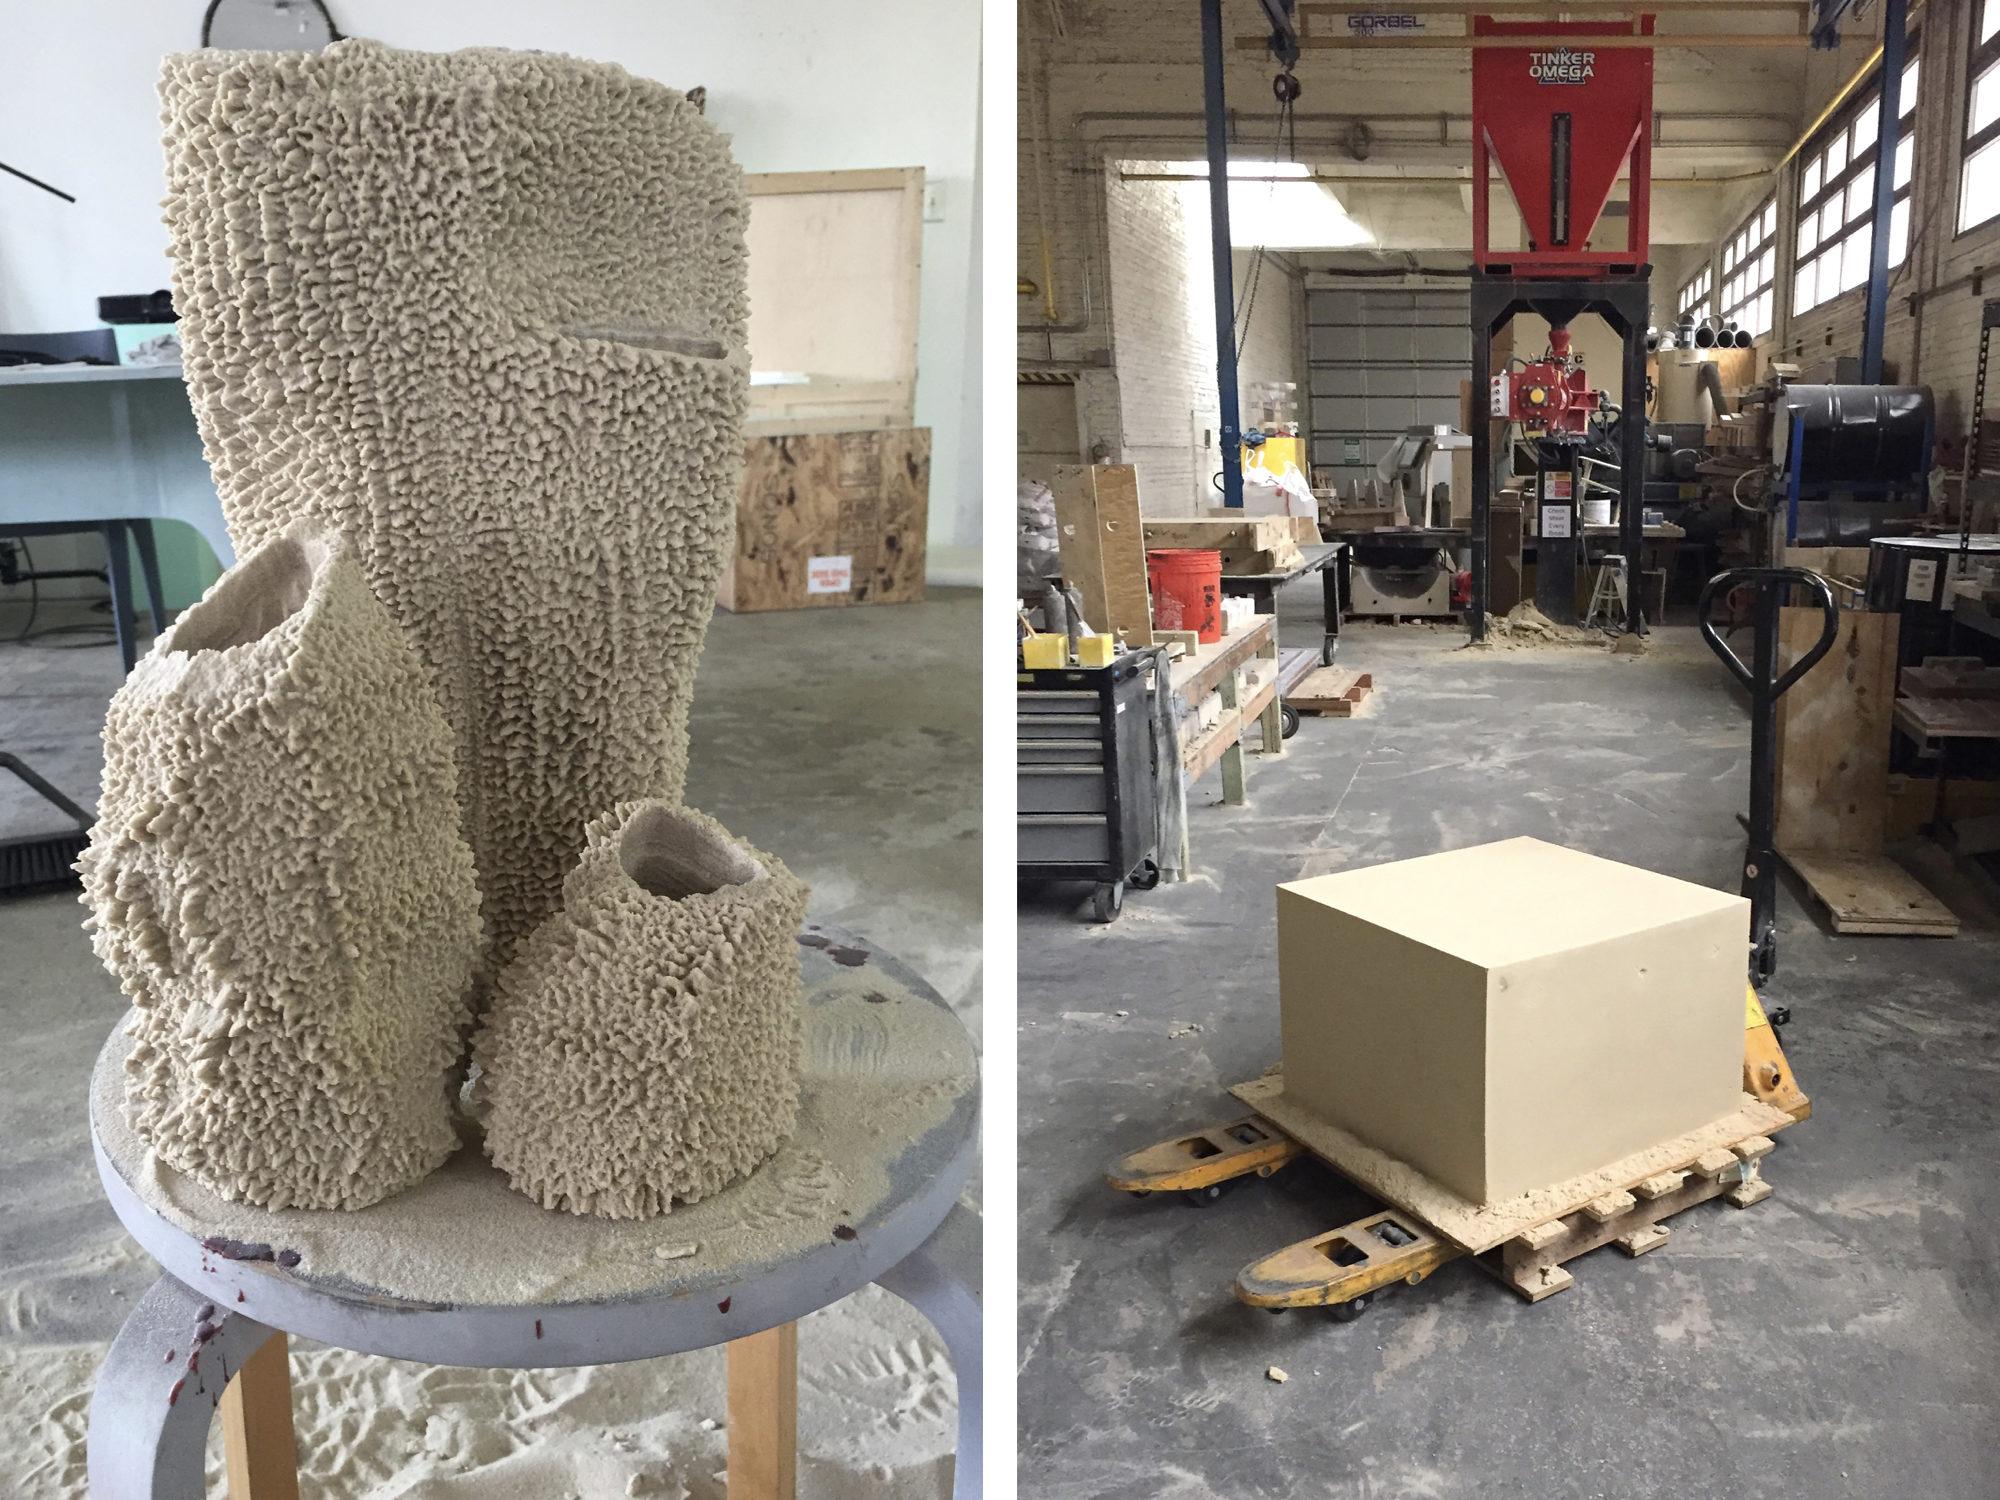 Steven Haulenbeek Elevates Sand to Sculpture in His RBS Series